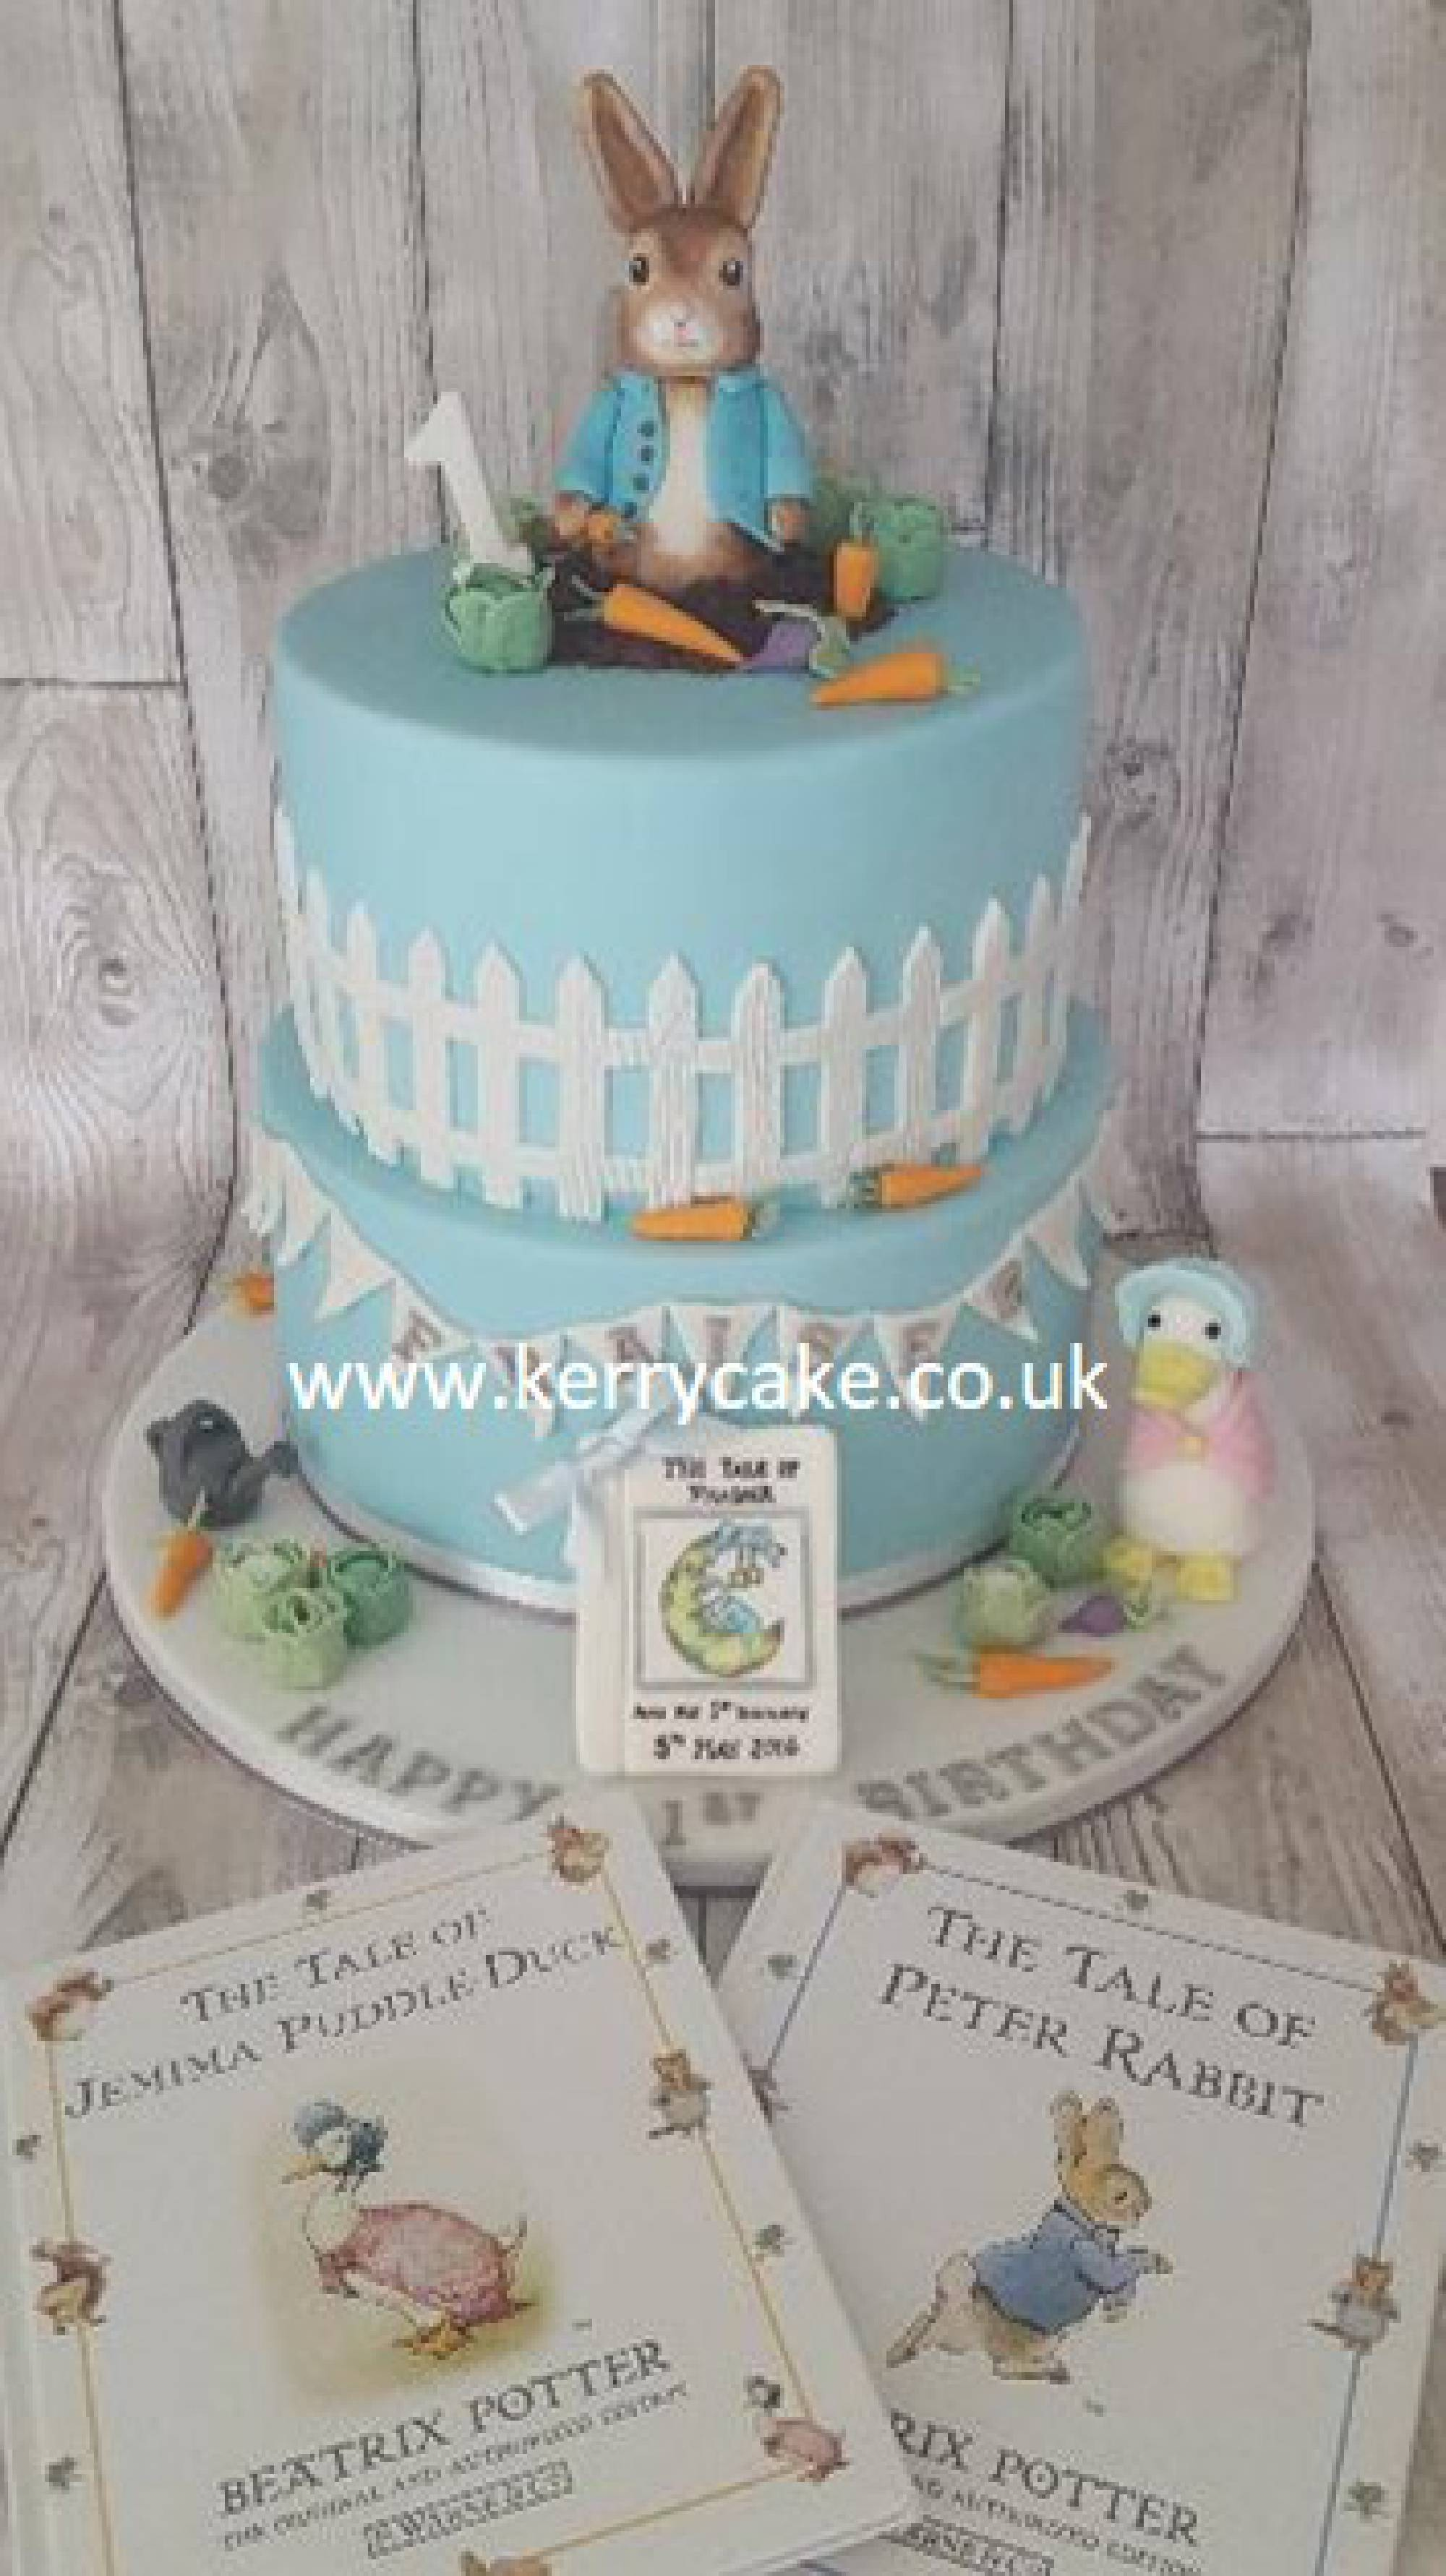 Kerrycake Birthday Cakes Classic Cakes Home Baked